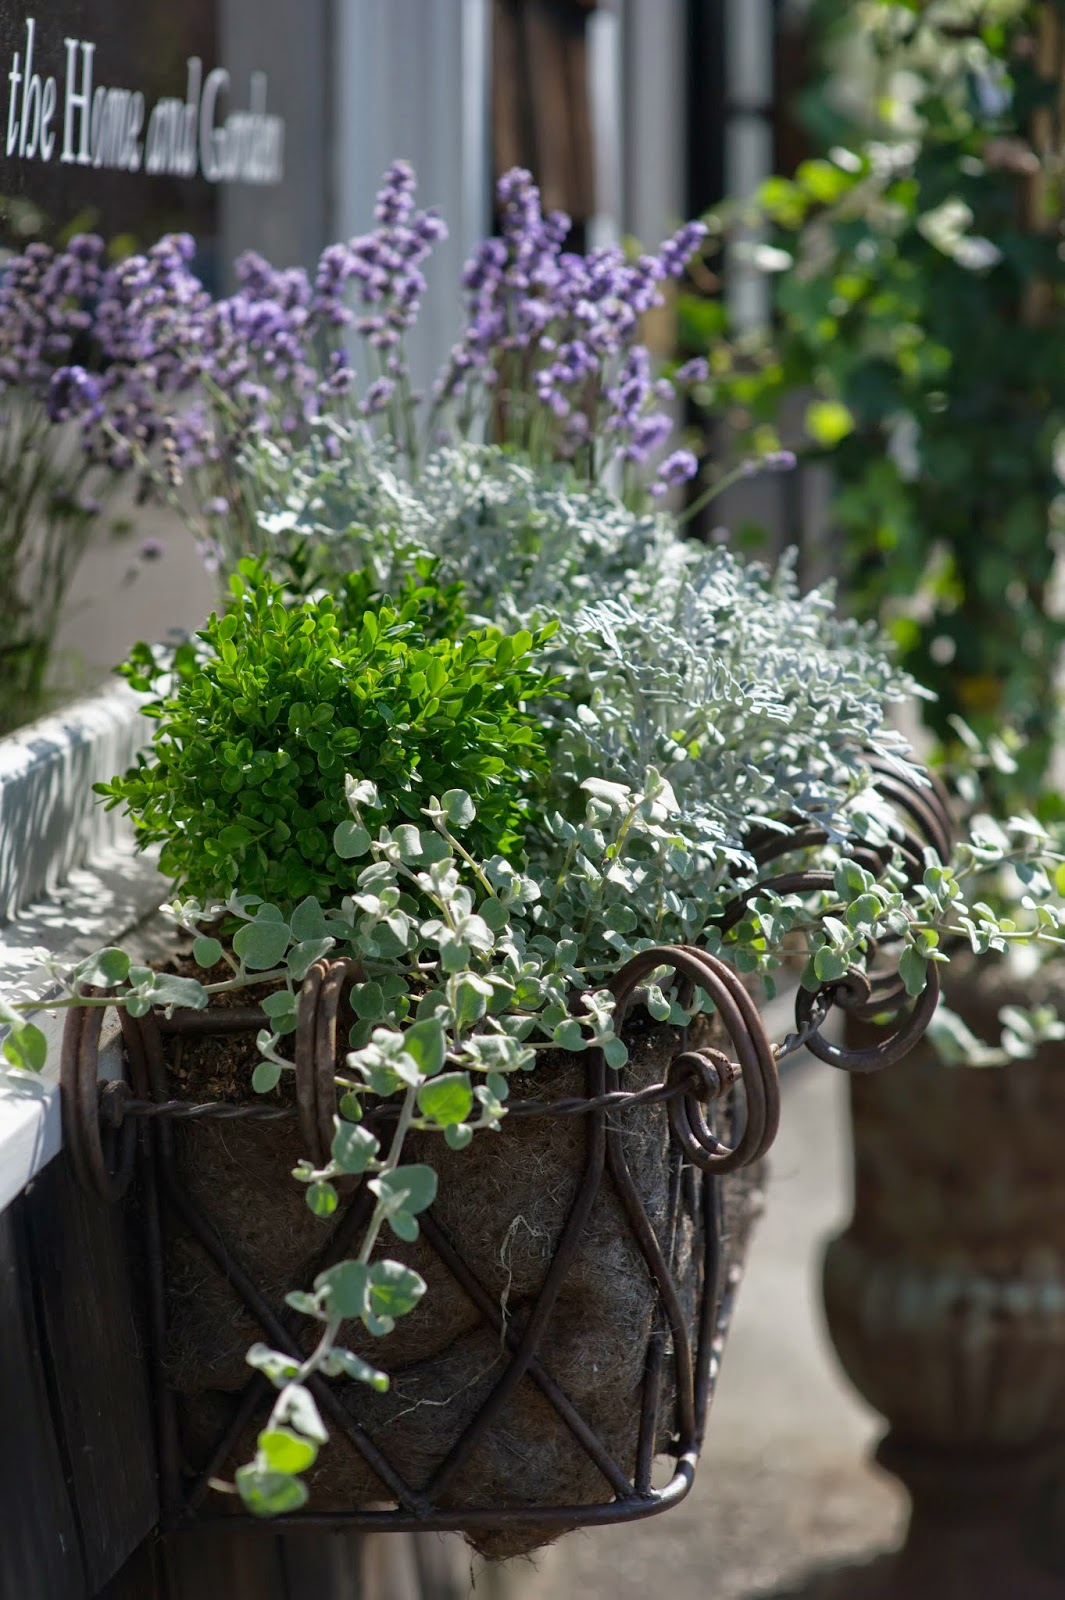 les fleurs : leah haydock photography : wire window box : european planter : french lavender, english boxwood, licorice & dusty miller